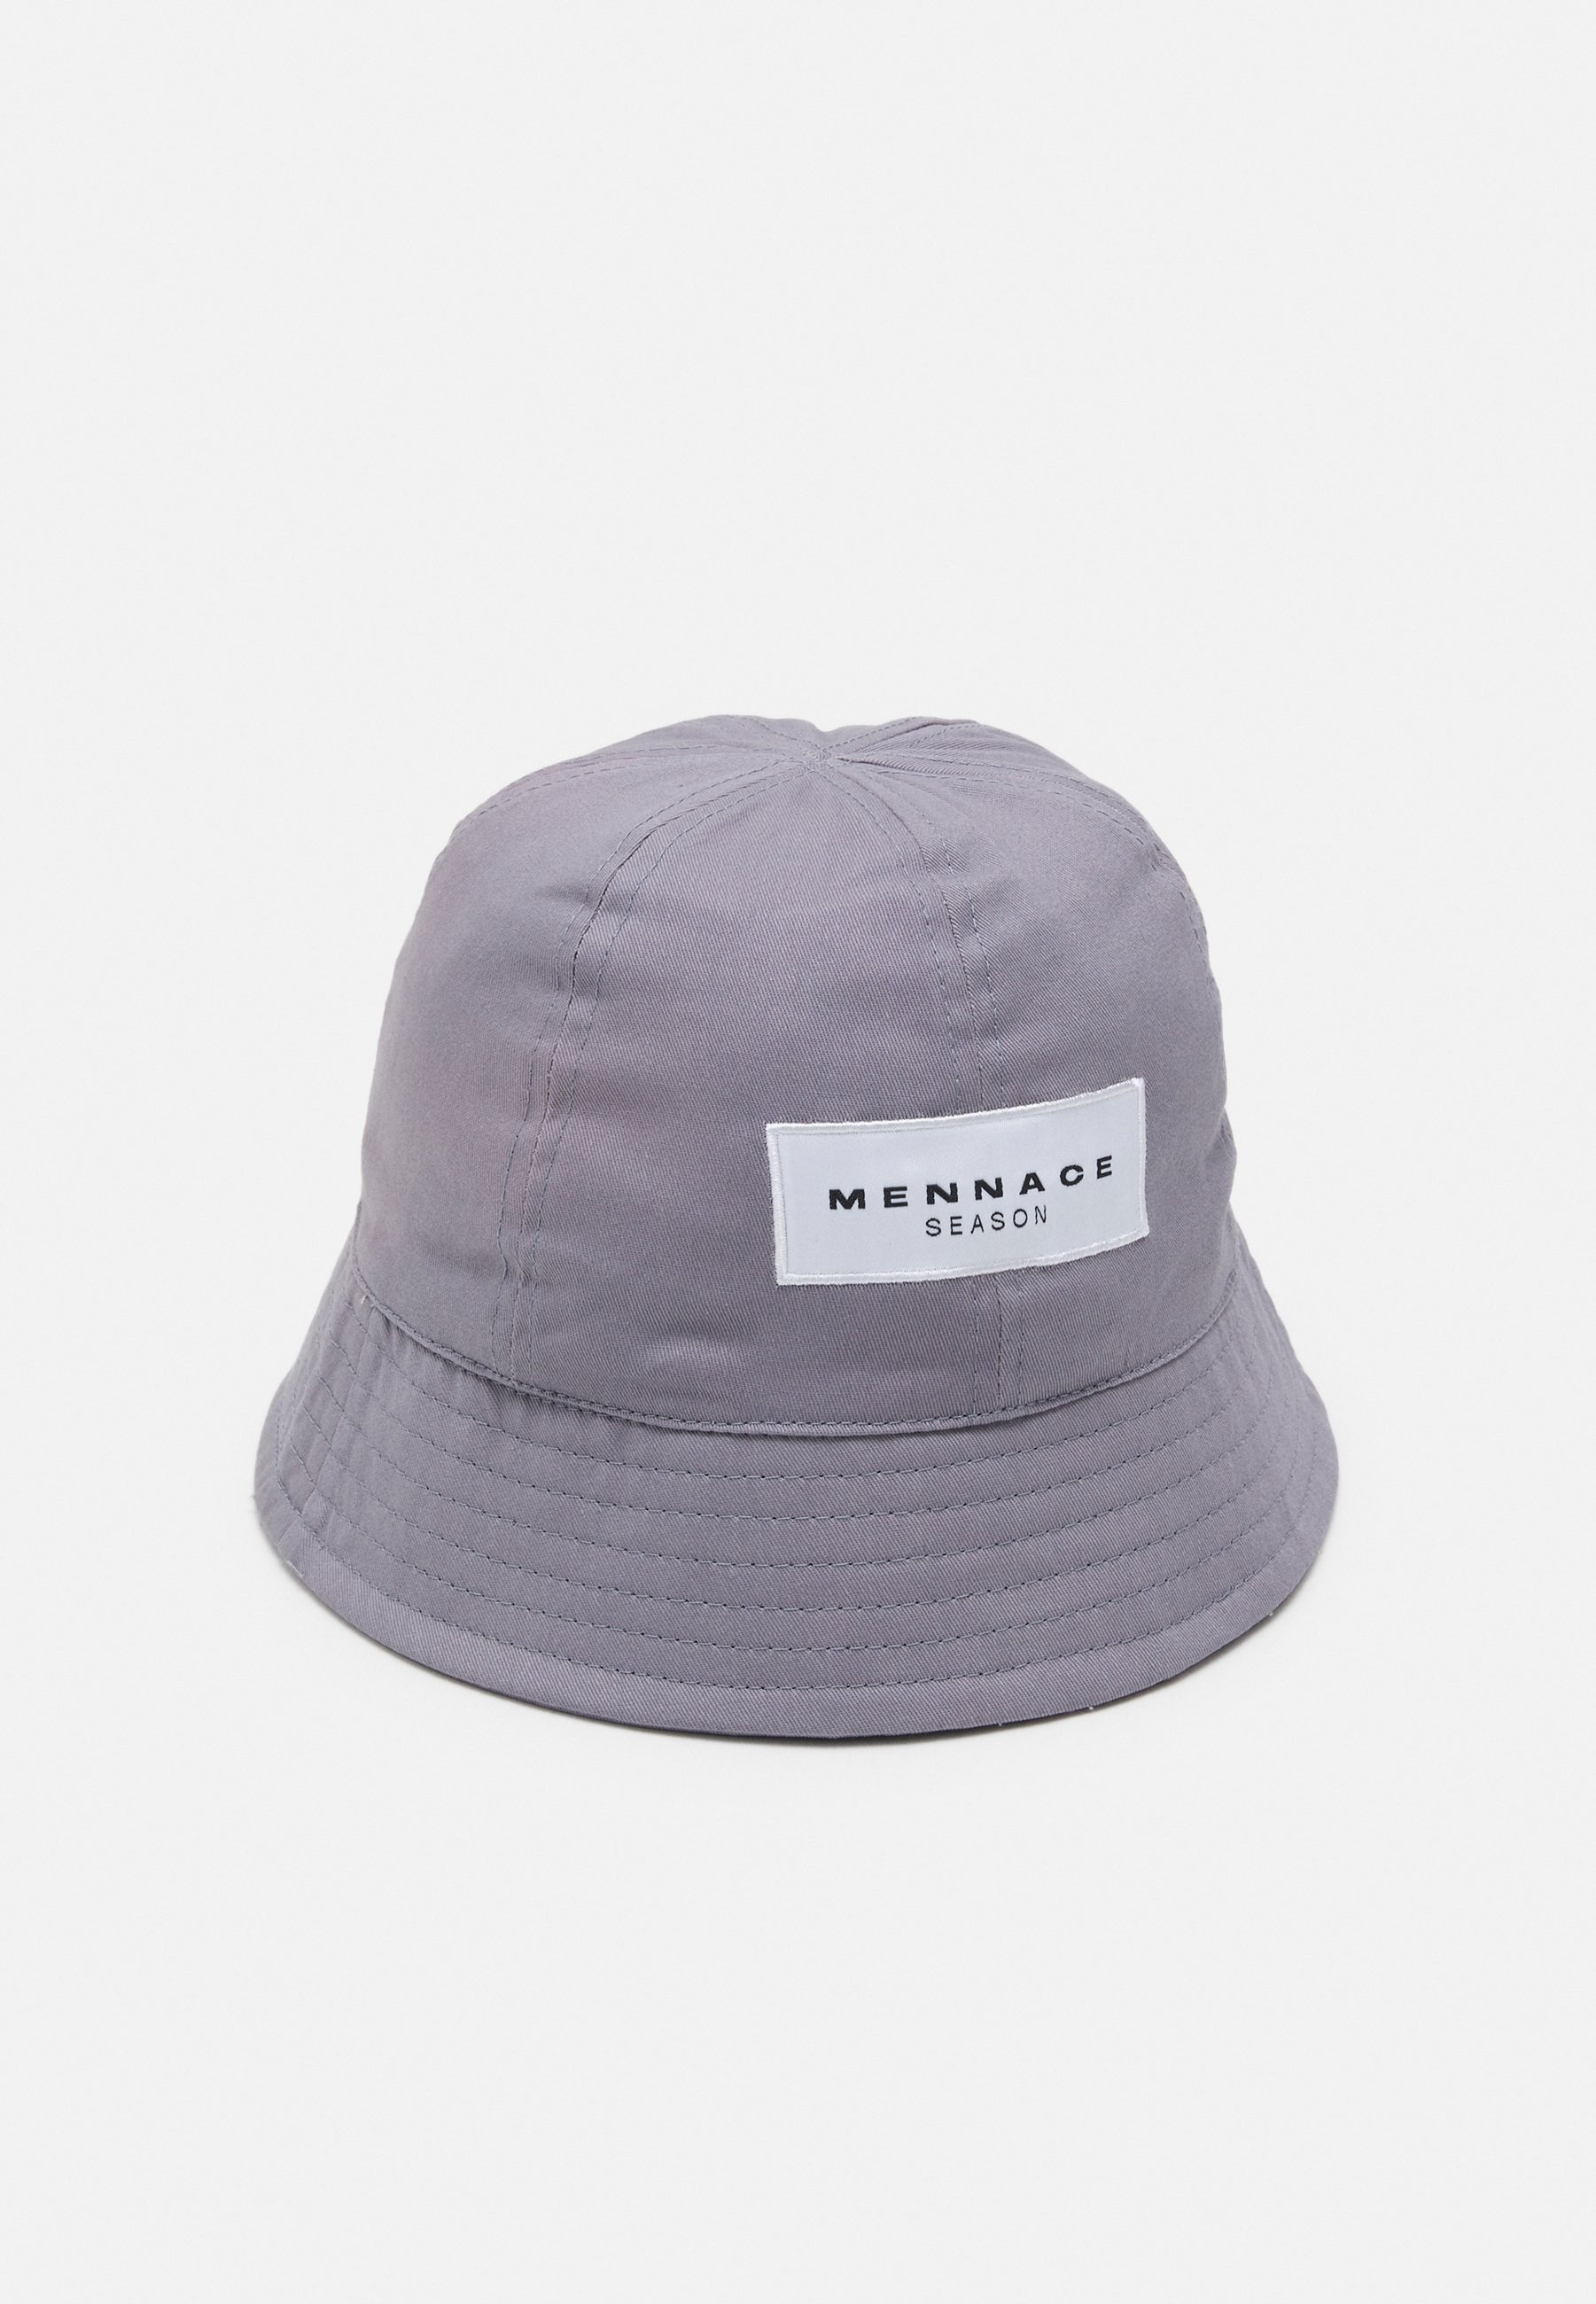 Homme SUNDAZE SLOPED BUCKET HAT - Chapeau